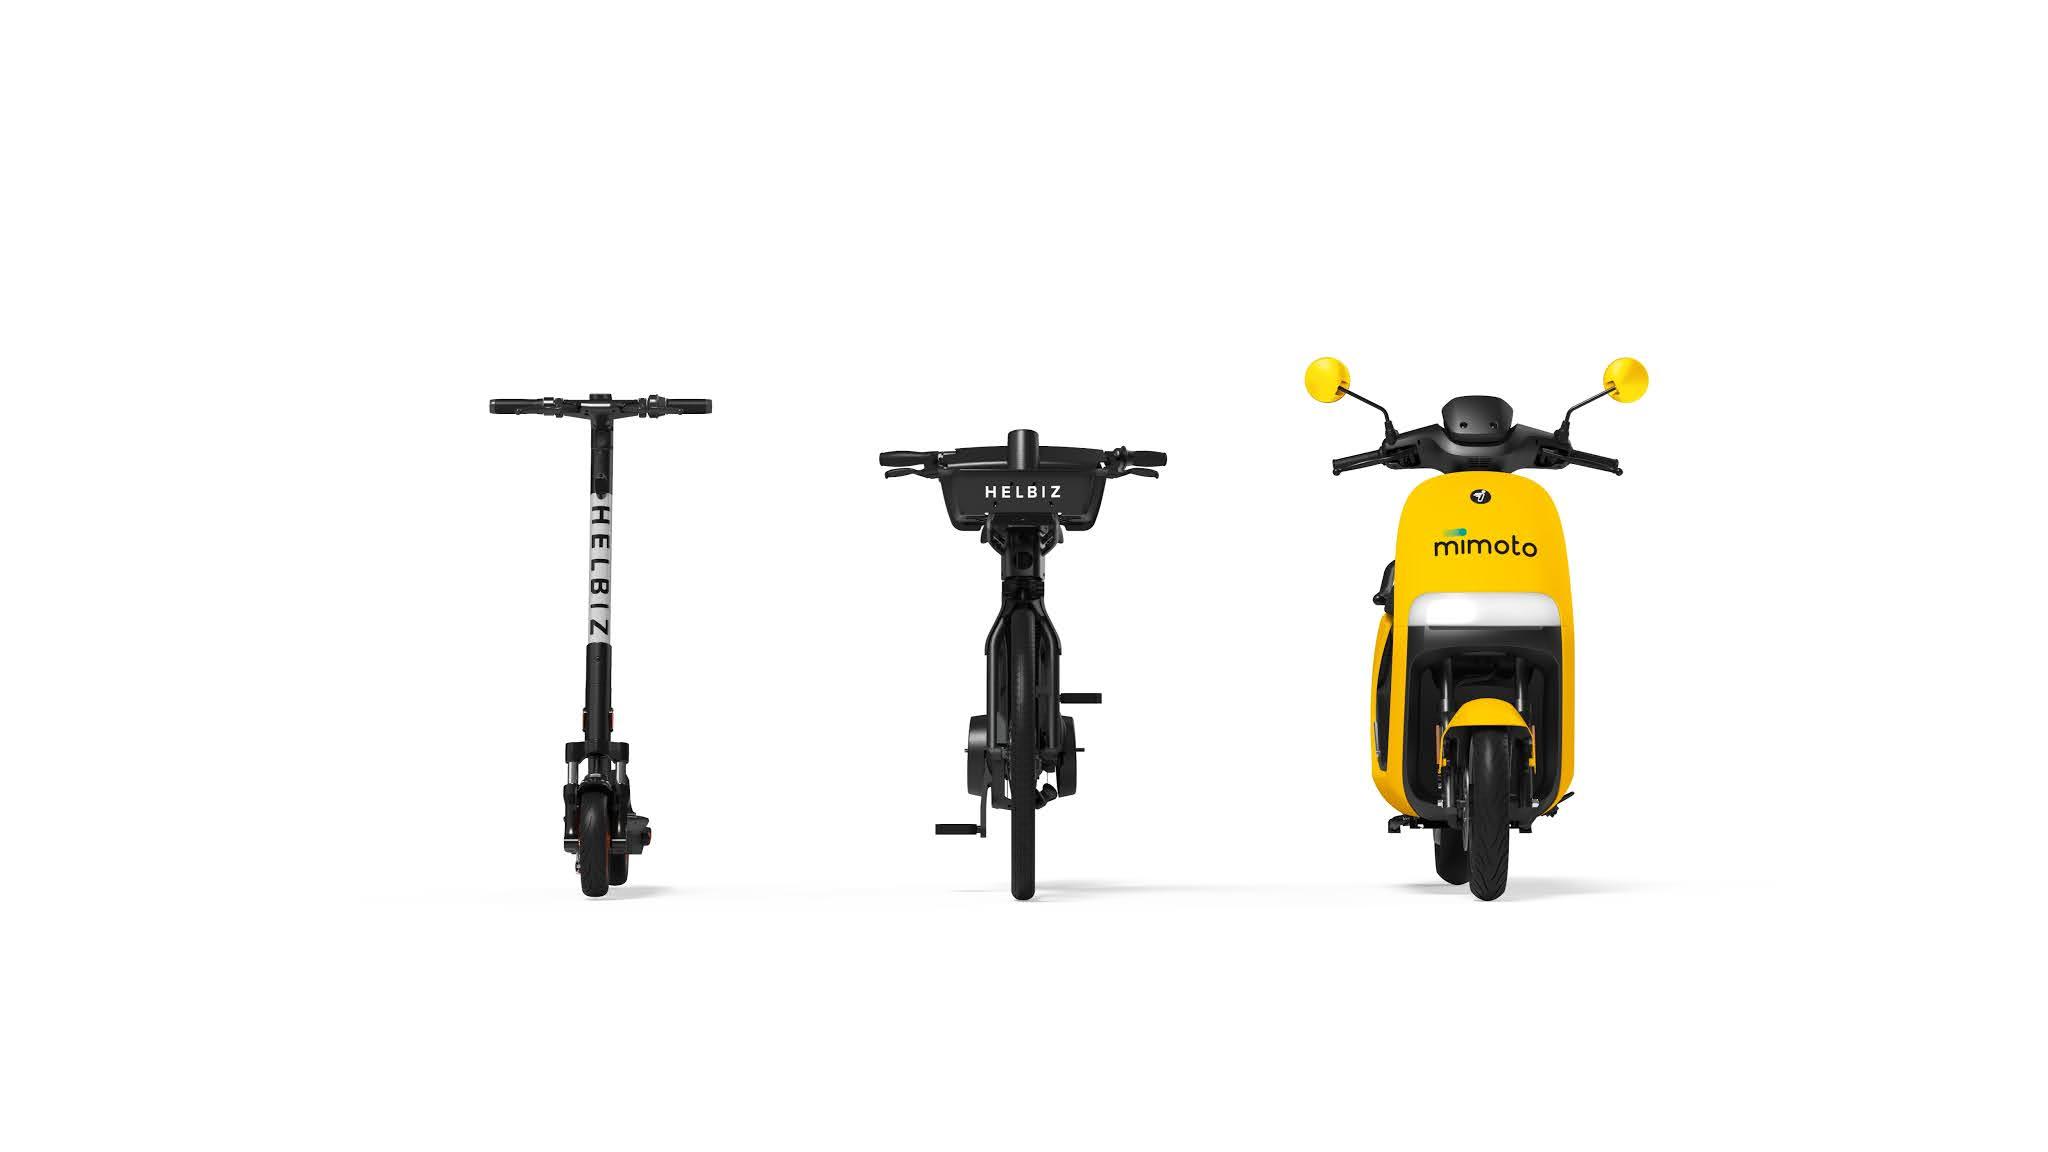 Helbiz acquires MiMoto to enhance micro-mobility vehicle fleet across Italy